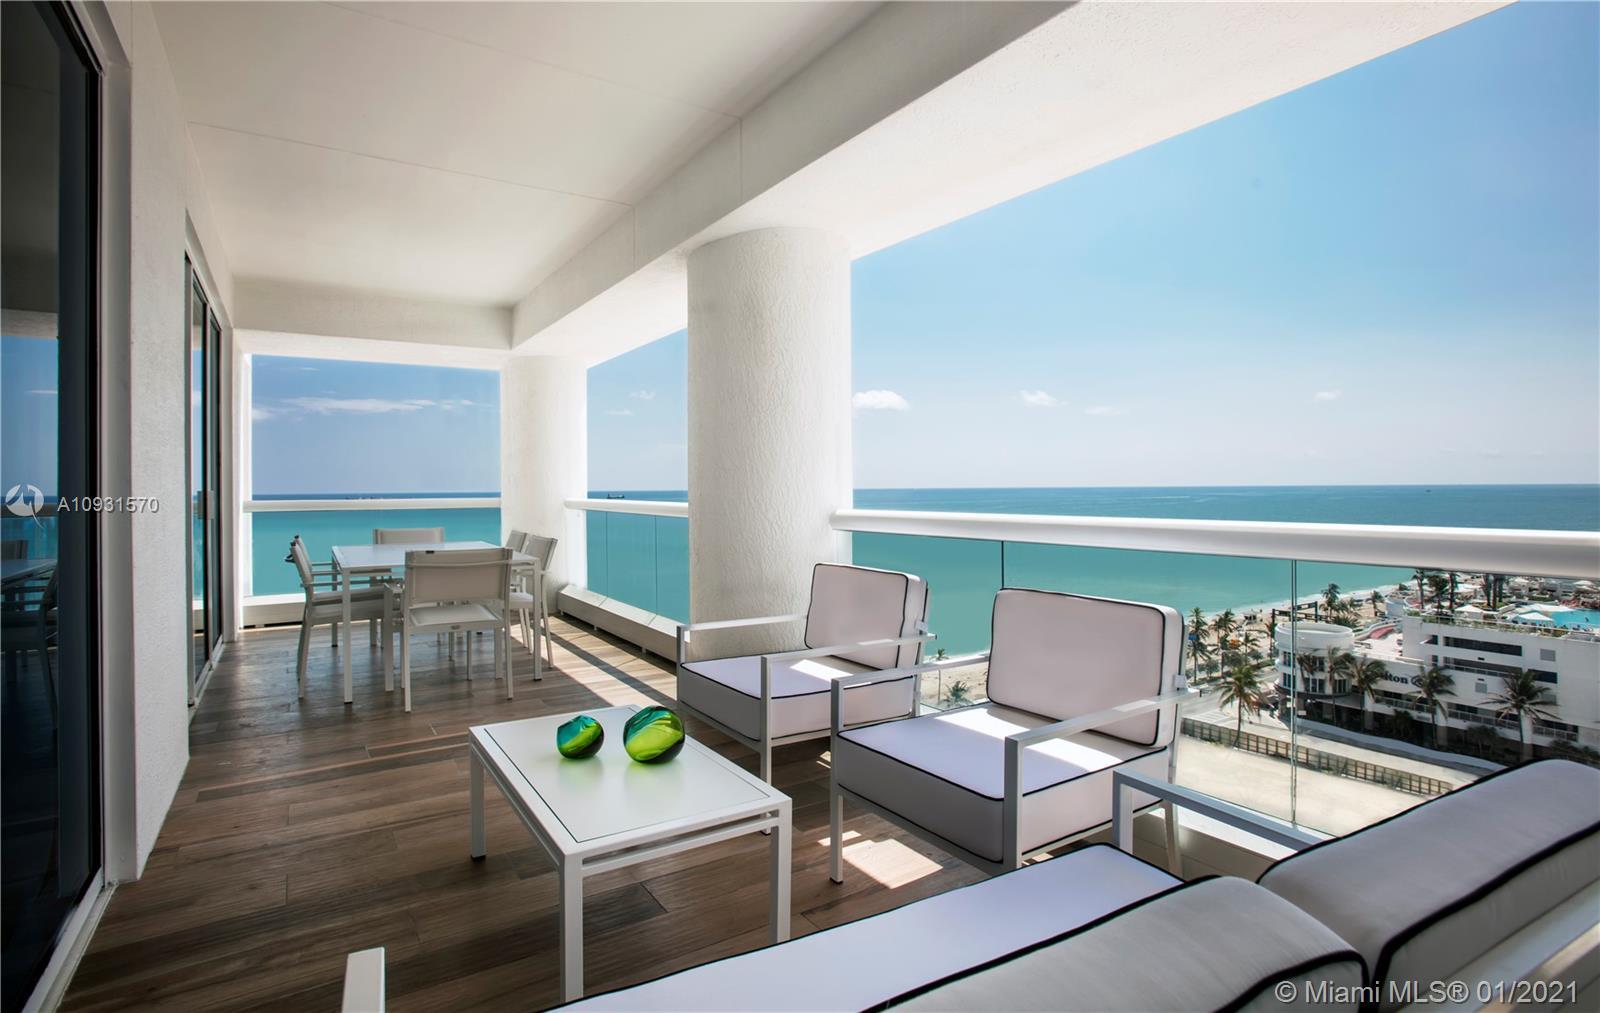 Ocean Resort Residences #H1014 - 551 N Fort Lauderdale Beach Blvd #H1014, Fort Lauderdale, FL 33304